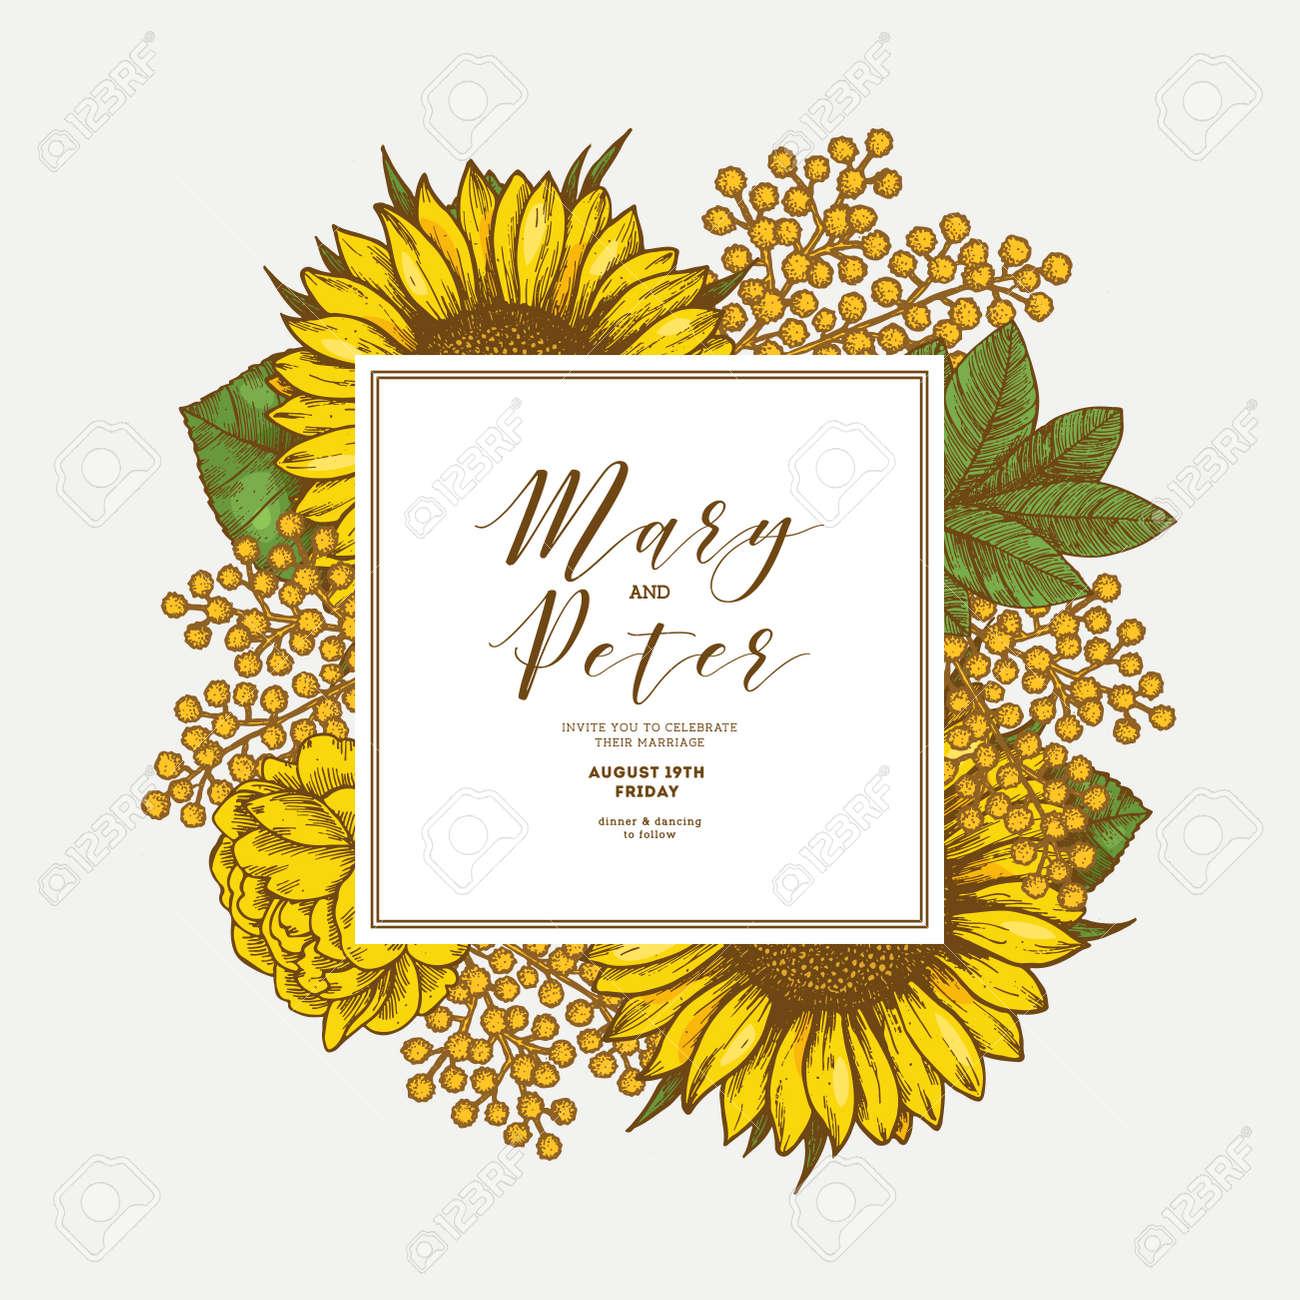 sunflower vintage wedding invitation yellow flowers card design